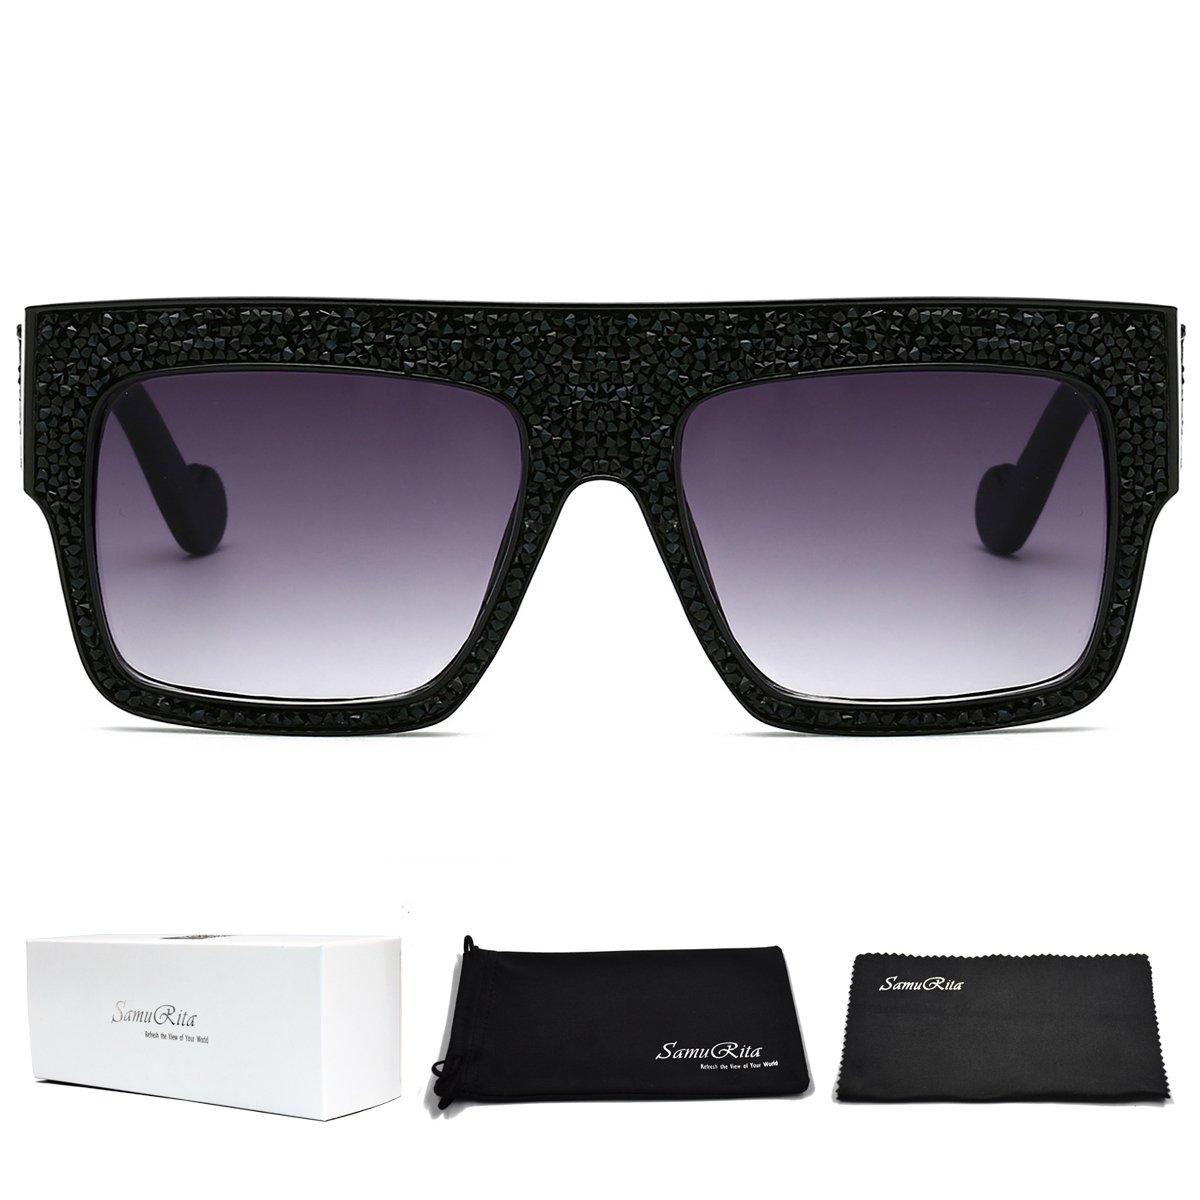 SamuRita Flat Top Square Rhinestone Sunglasses Full Crystal Brand Eyewear(Black Crystal/Black Lenses)